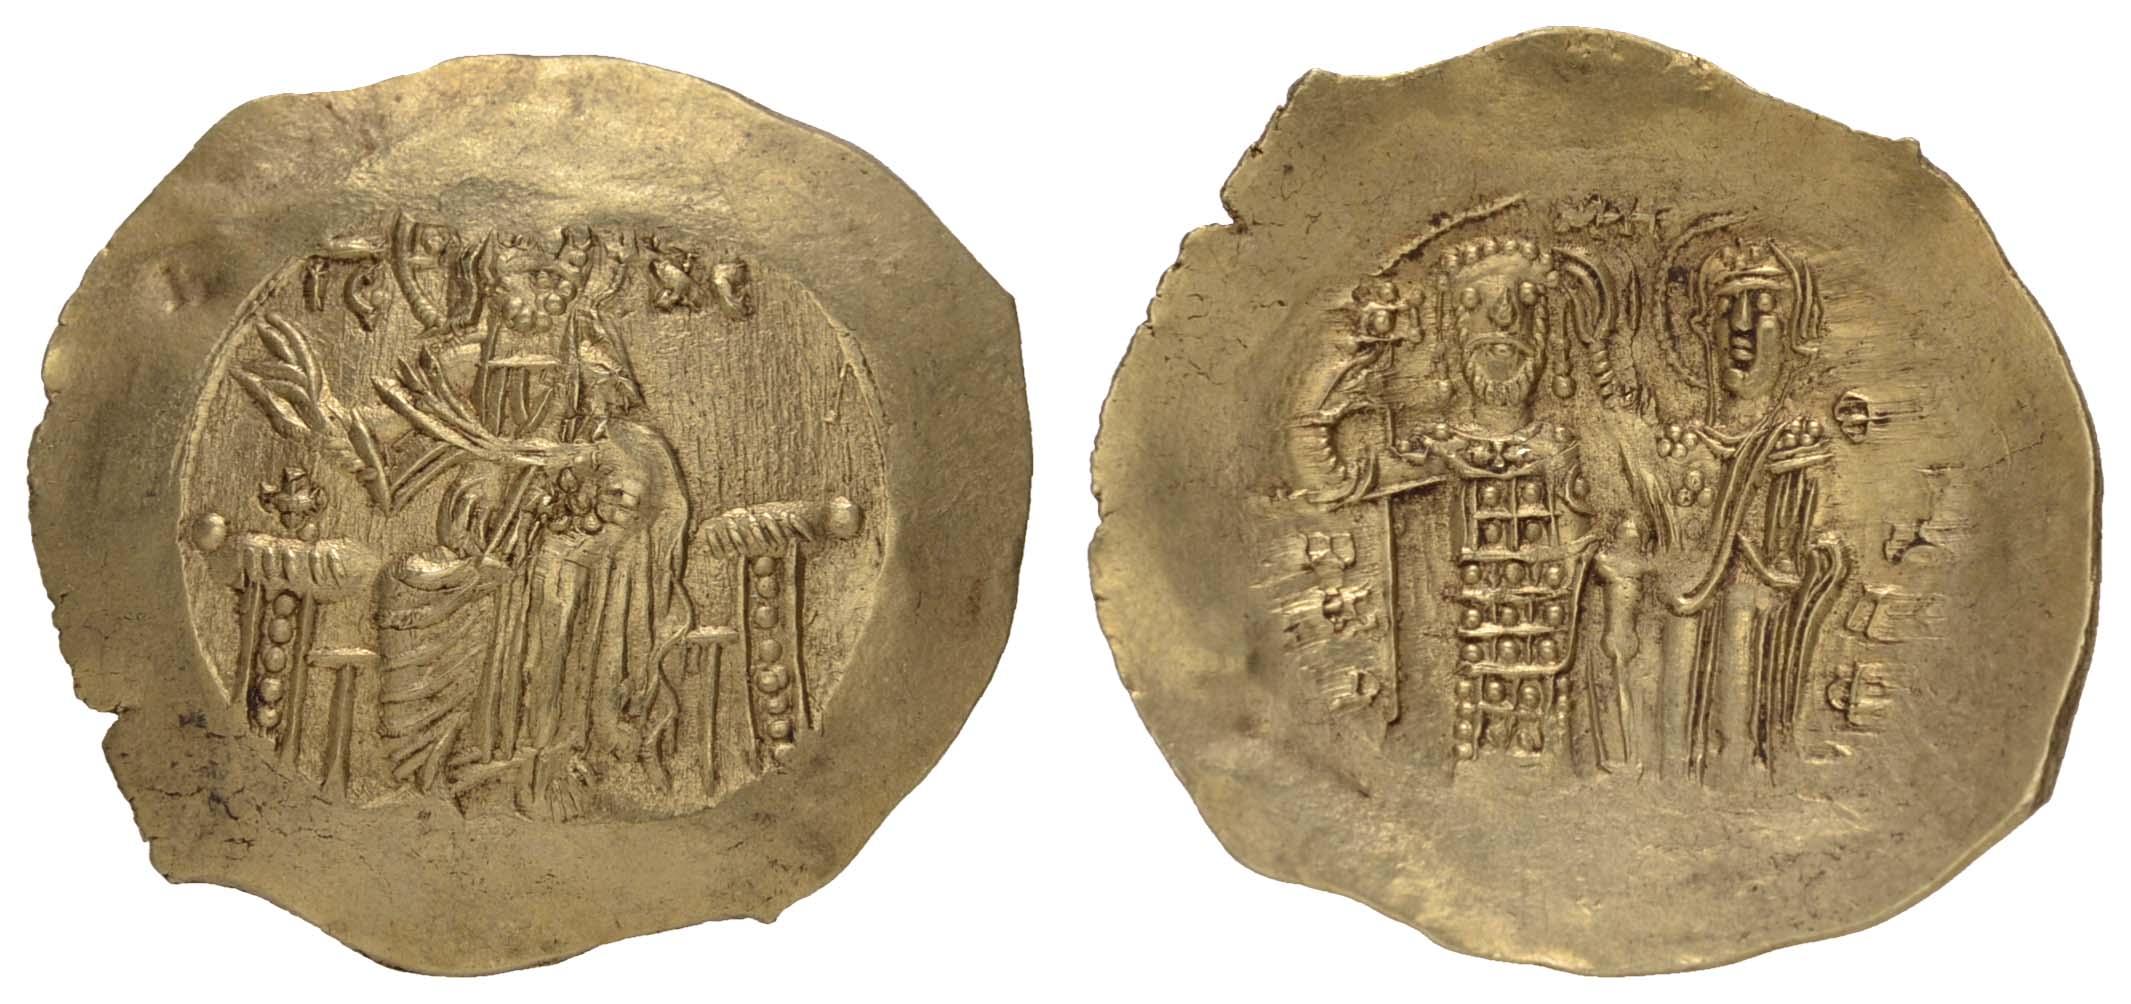 Lot 374 - Antike Byzanz -  Auktionshaus Ulrich Felzmann GmbH & Co. KG Coins single lots